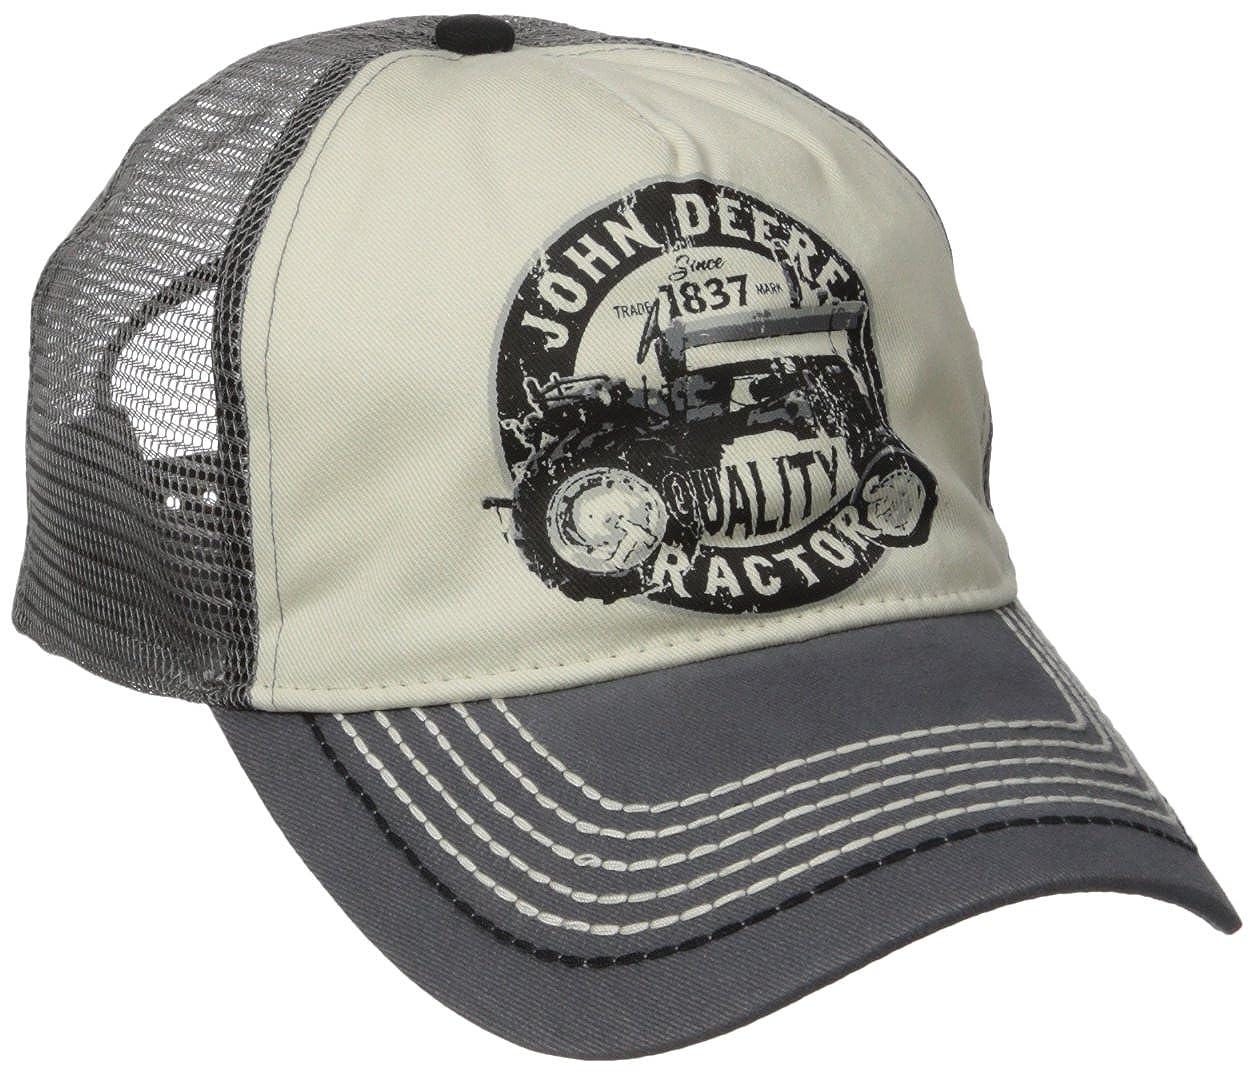 John Deere Men's Vintage Tractor Mesh Back Cap One Size John Deere Men' s Apparel 13080288CH